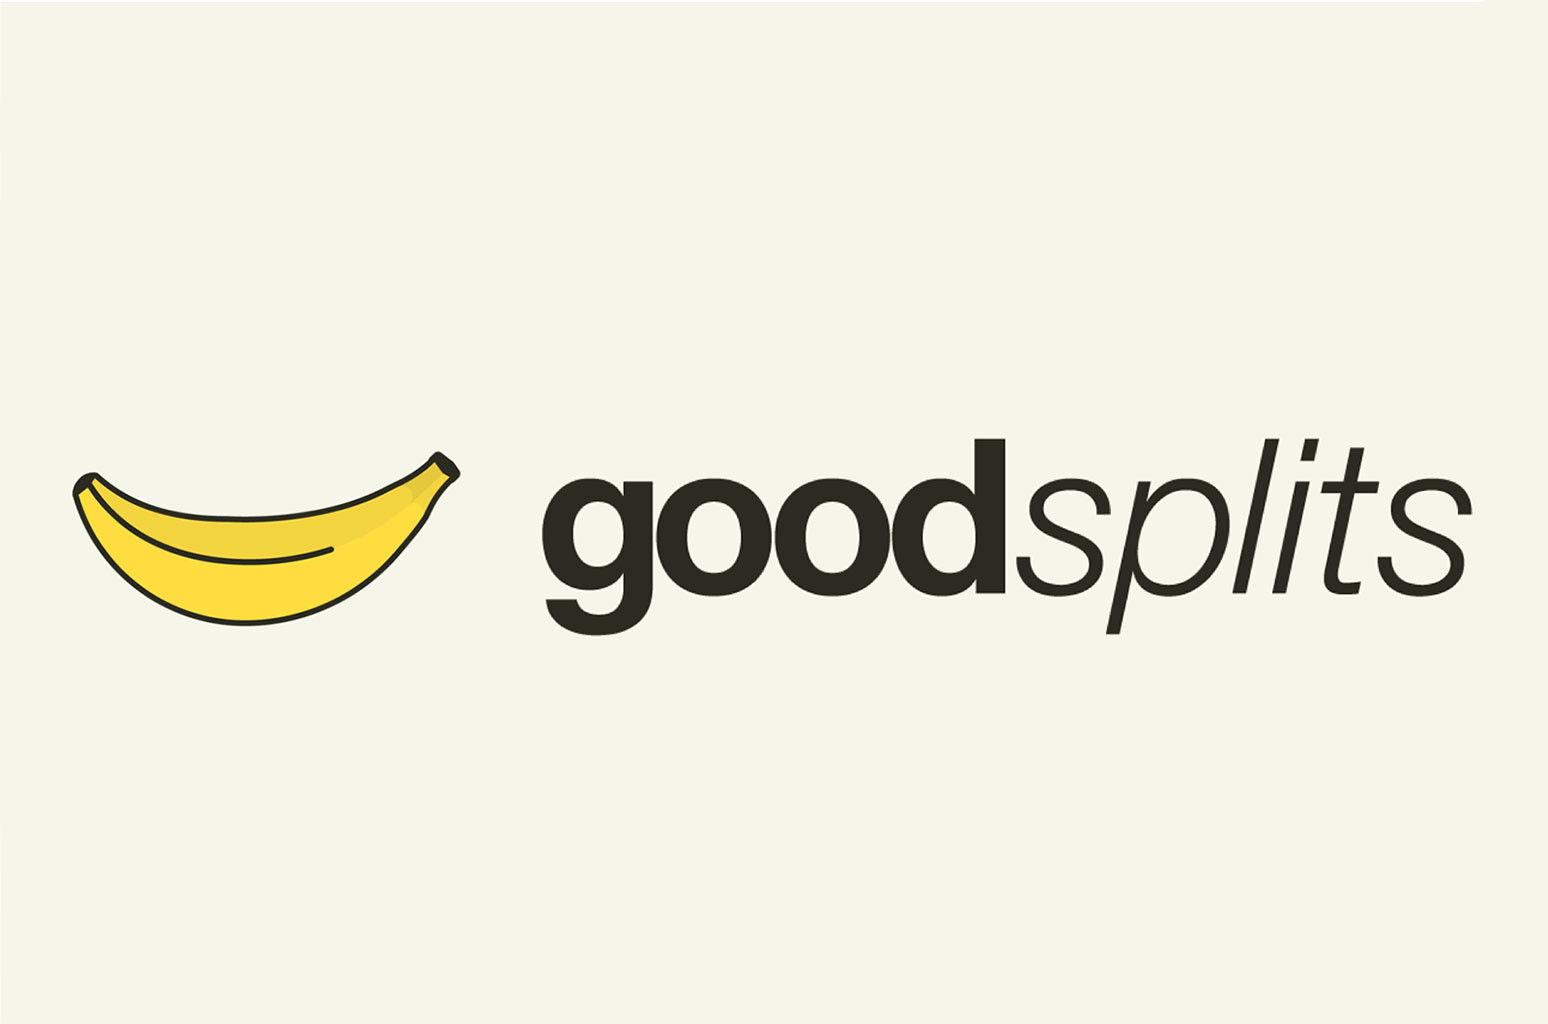 good splits